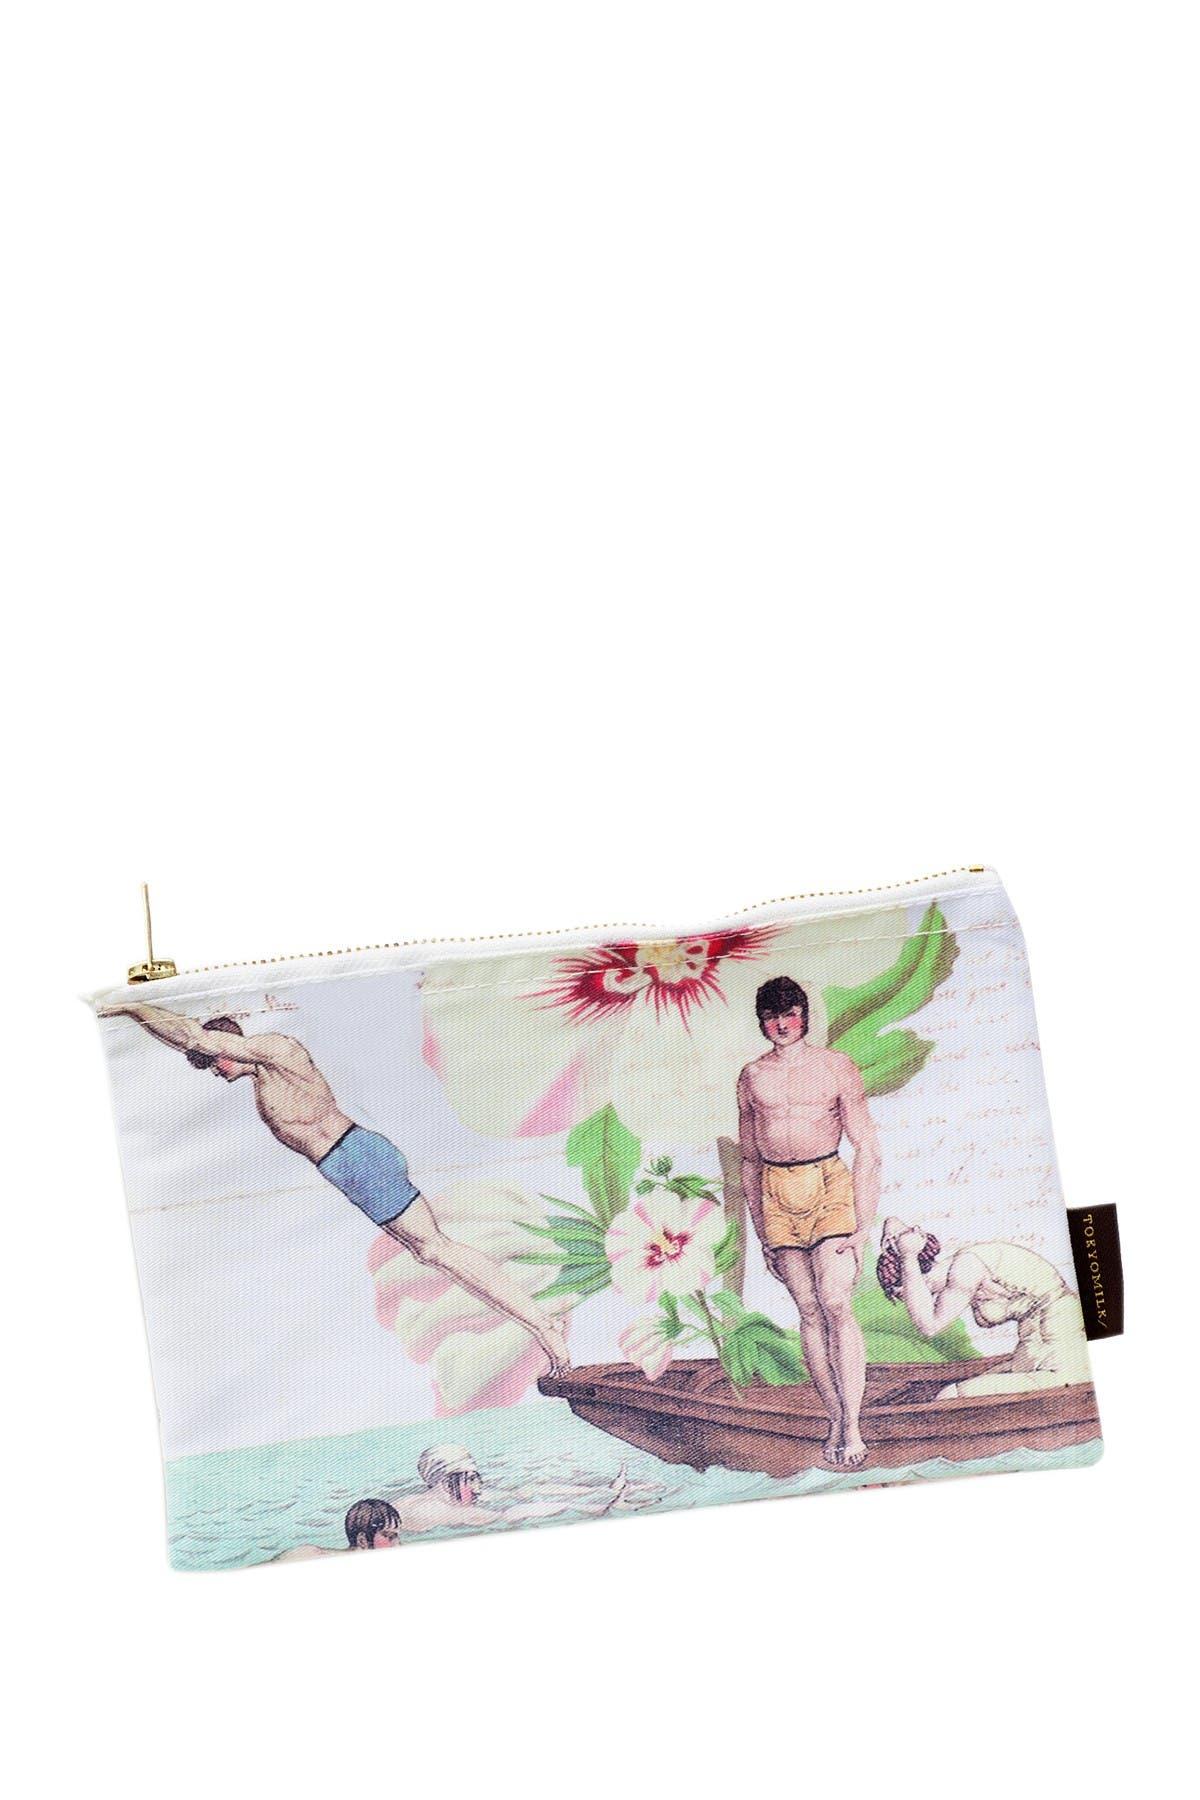 Image of Lollia Hawaiian Divers Cosmetic Bag